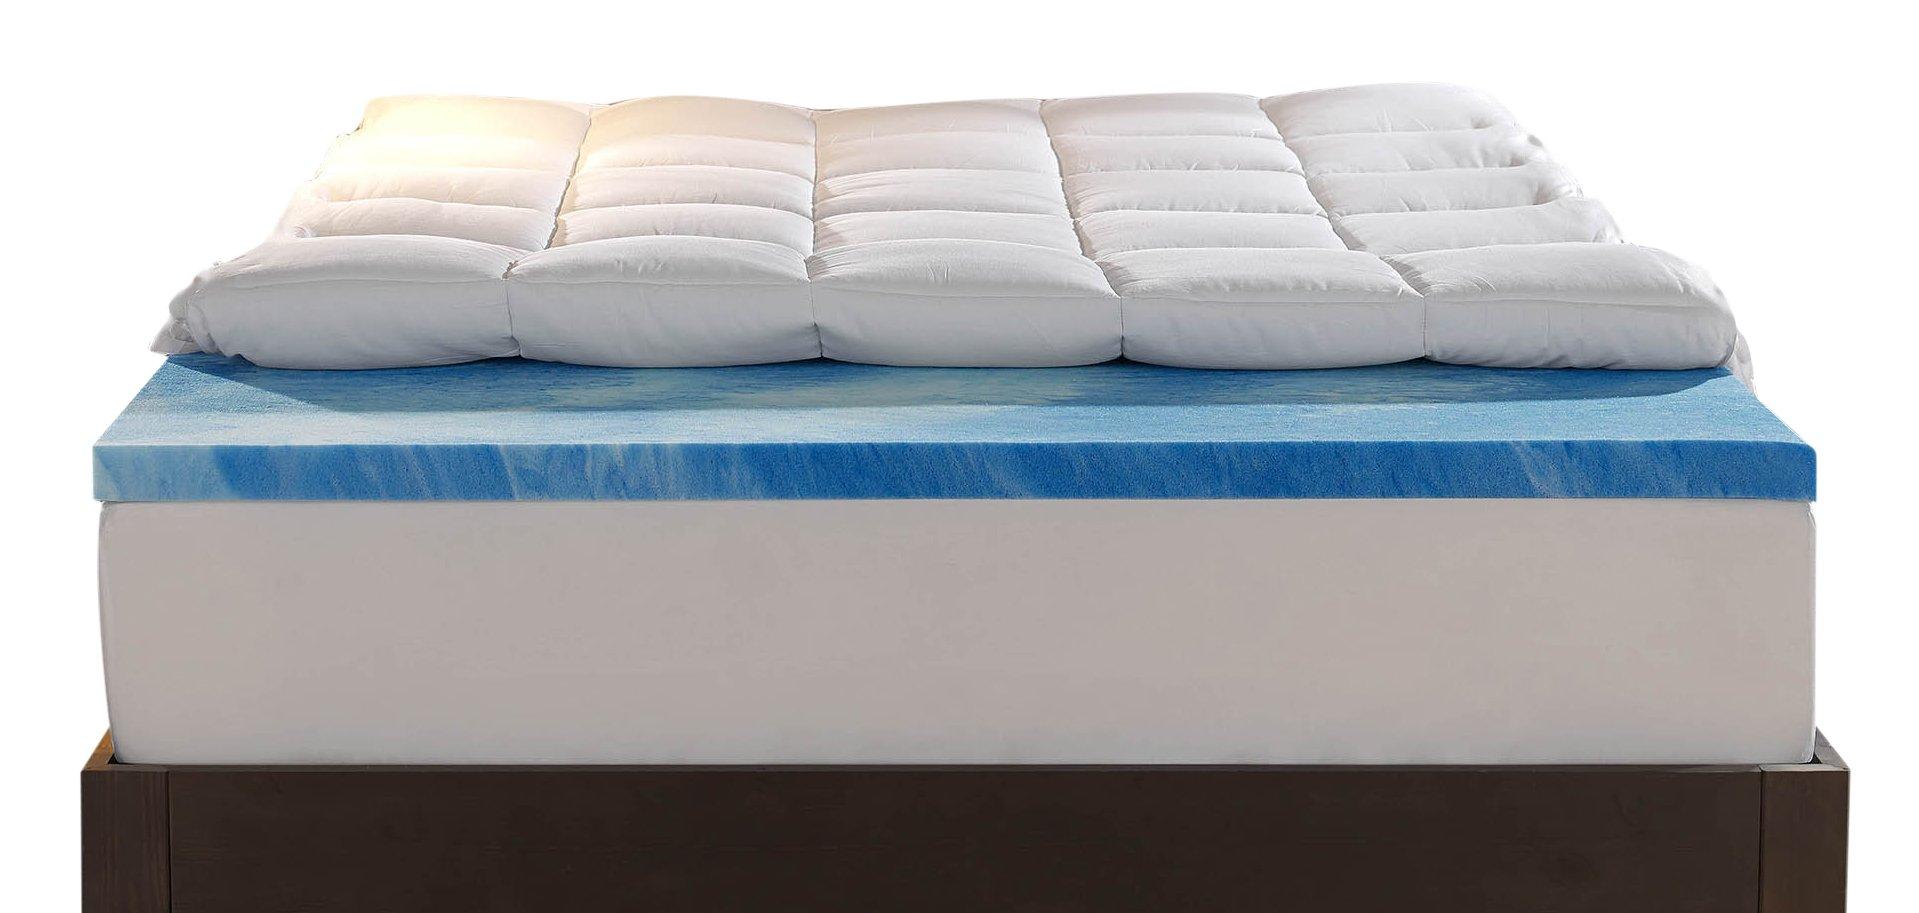 Sleep Innovations 4 Inch Dual Layer Mattress Topper Gel